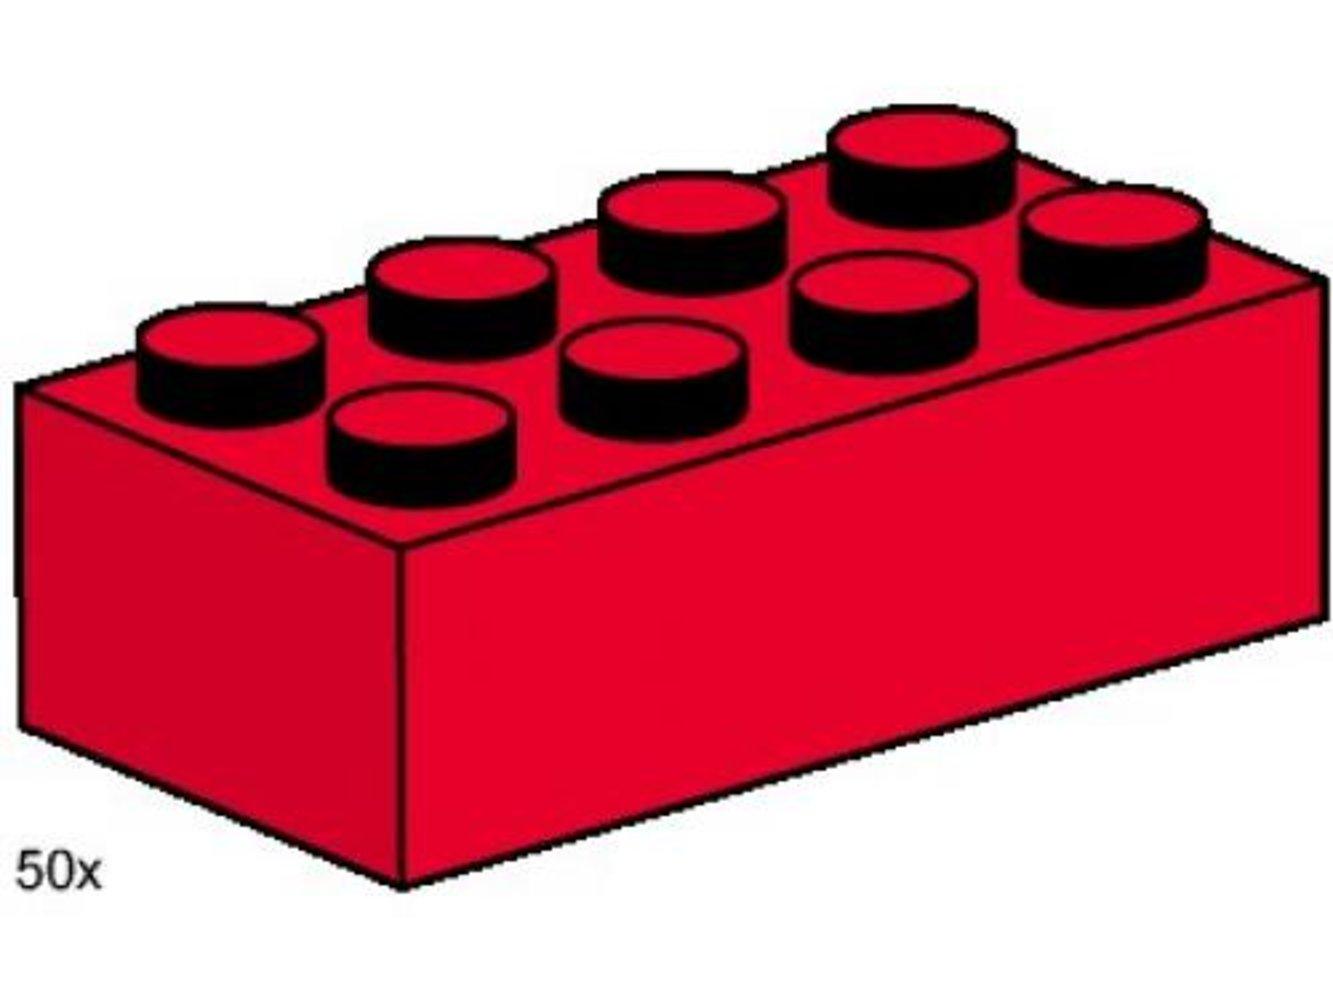 2 x 4 Red Bricks